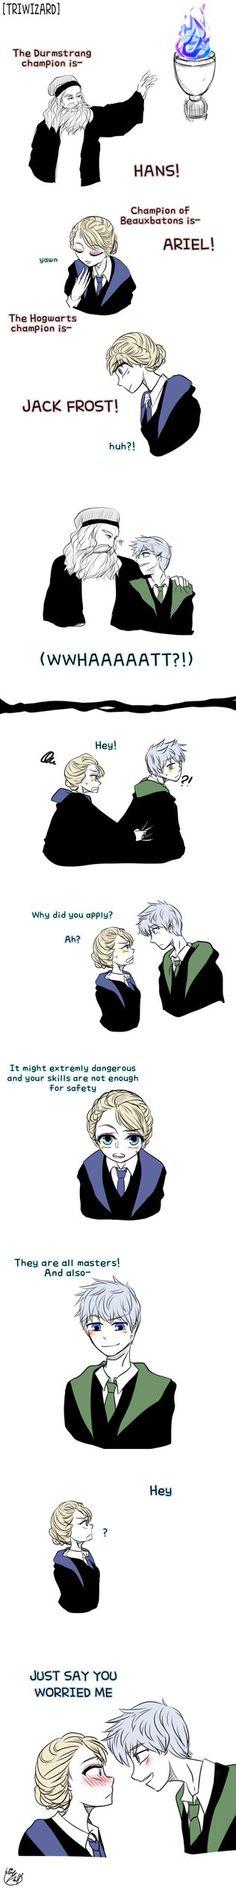 Jack Frost and Elsa Harry potter